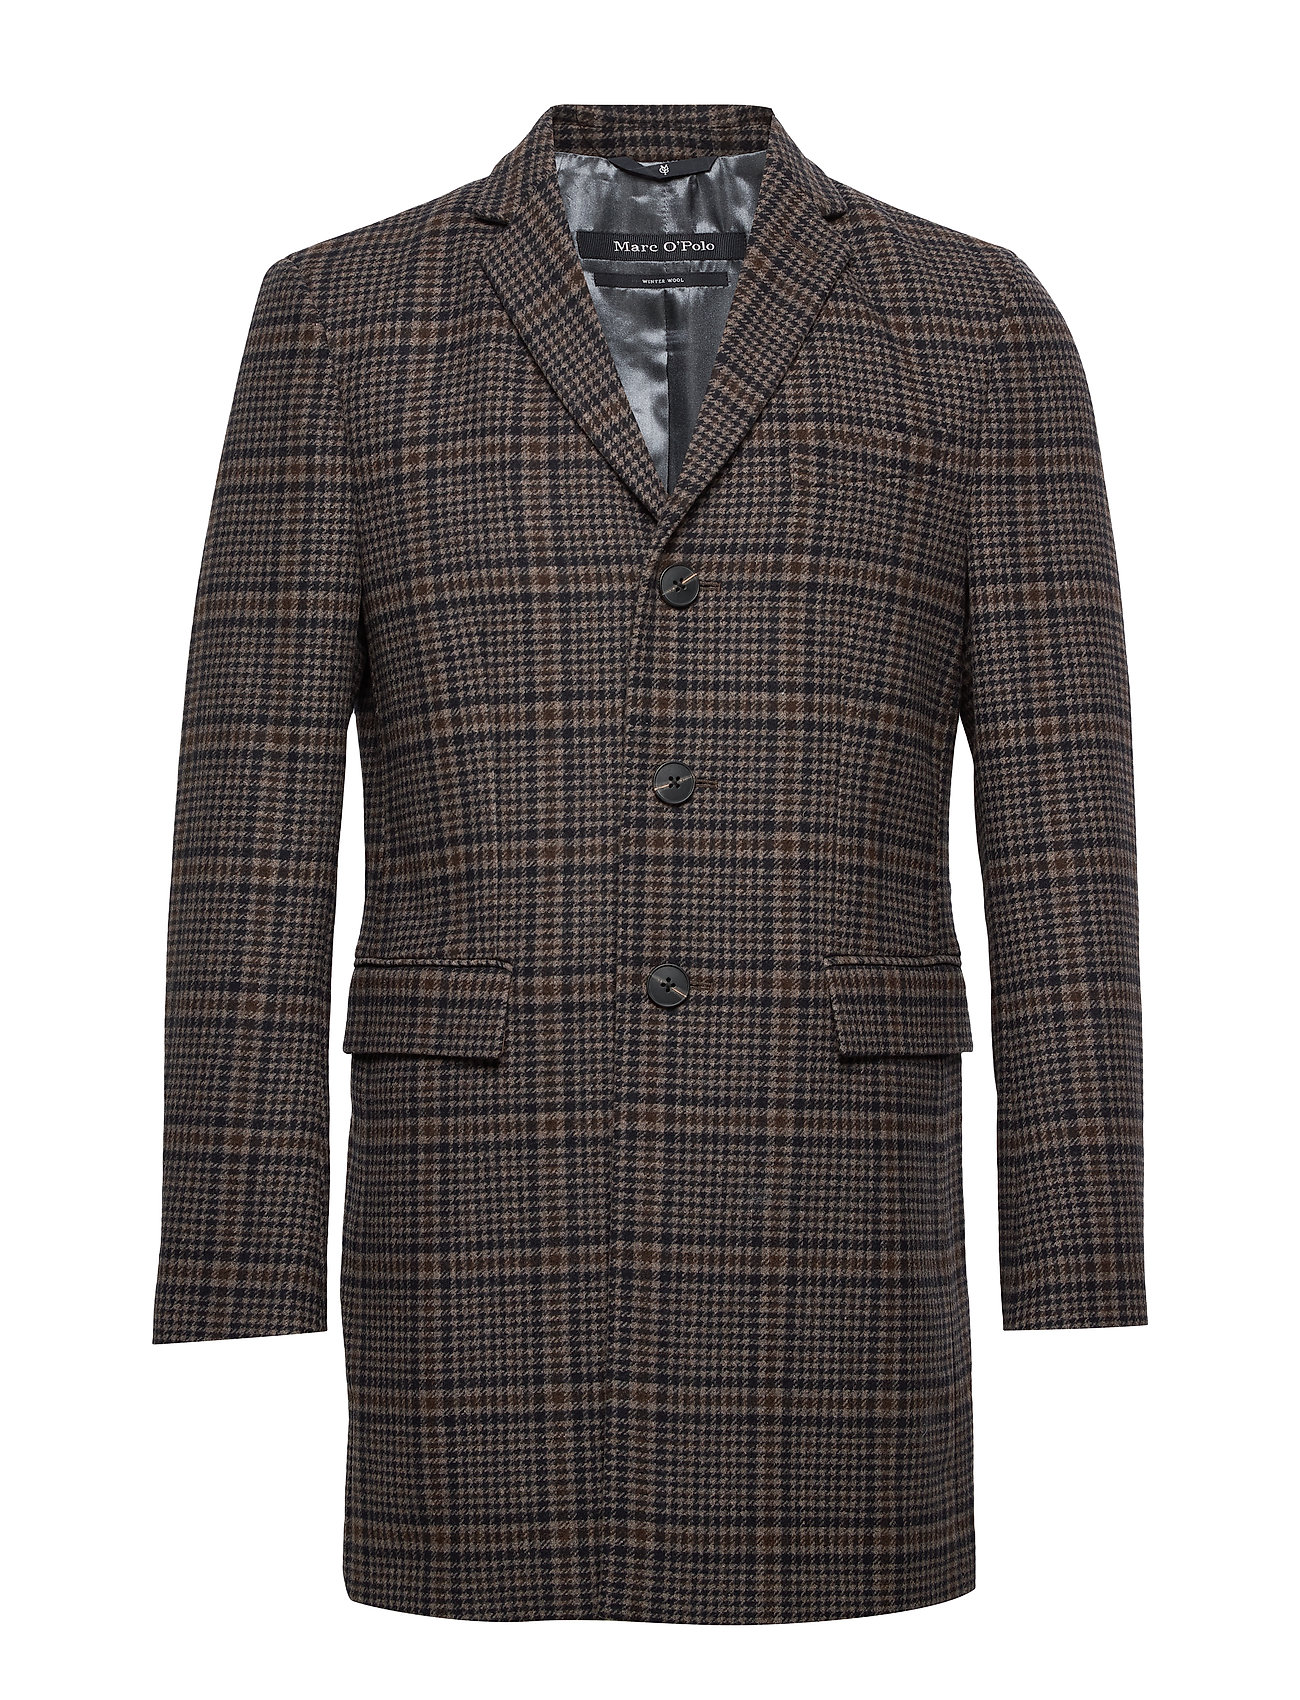 Marc O'Polo Coat, shaped fit, long sleeve, reve - DARK GREY MELANGE